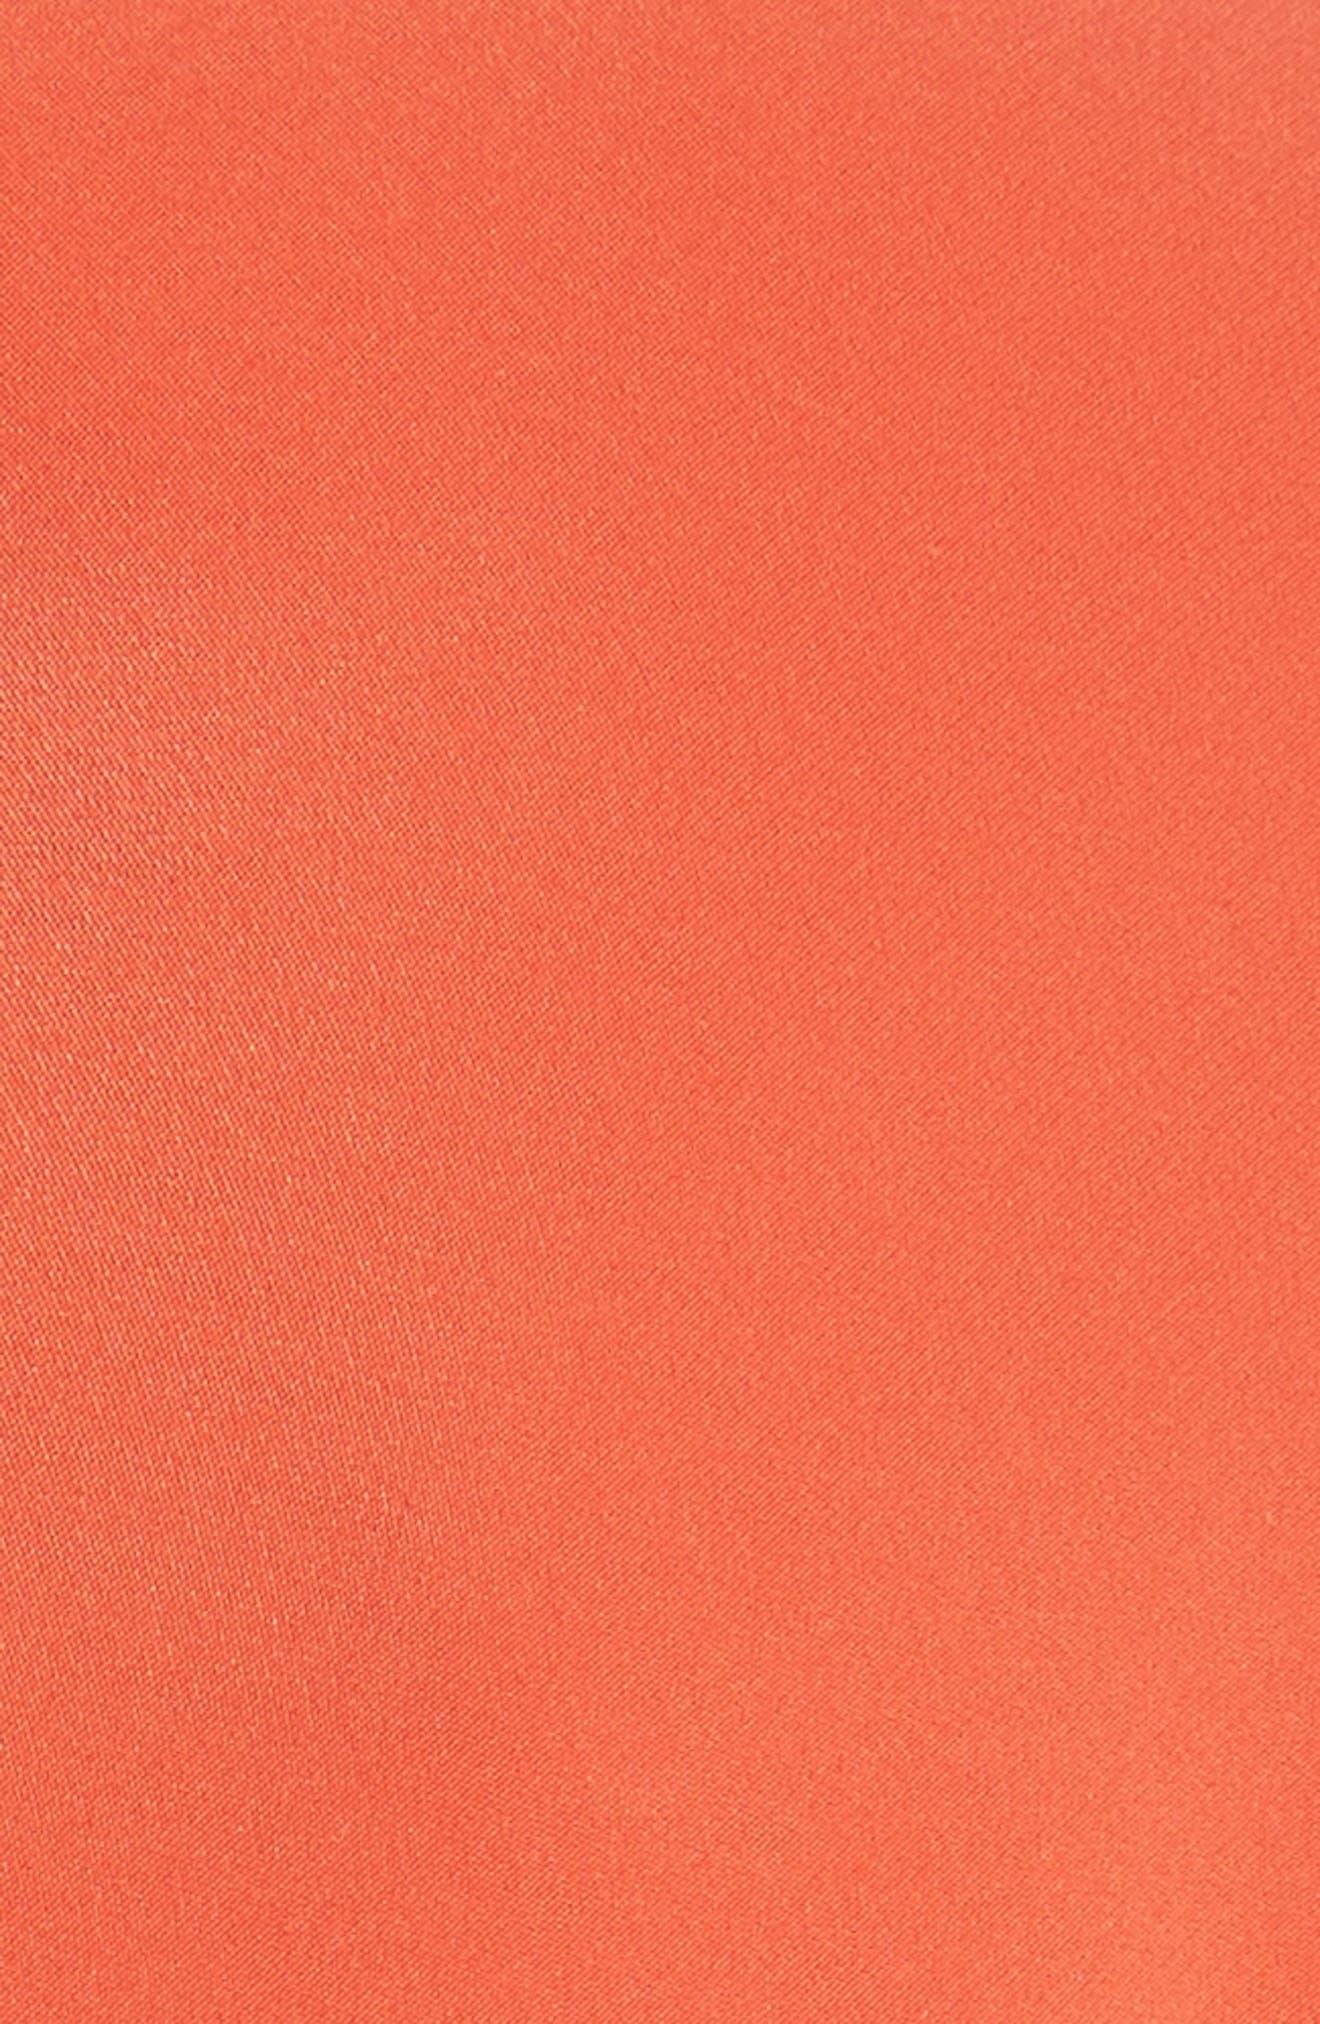 Twist Detail Silk Dress,                             Alternate thumbnail 6, color,                             Persimmon Orange